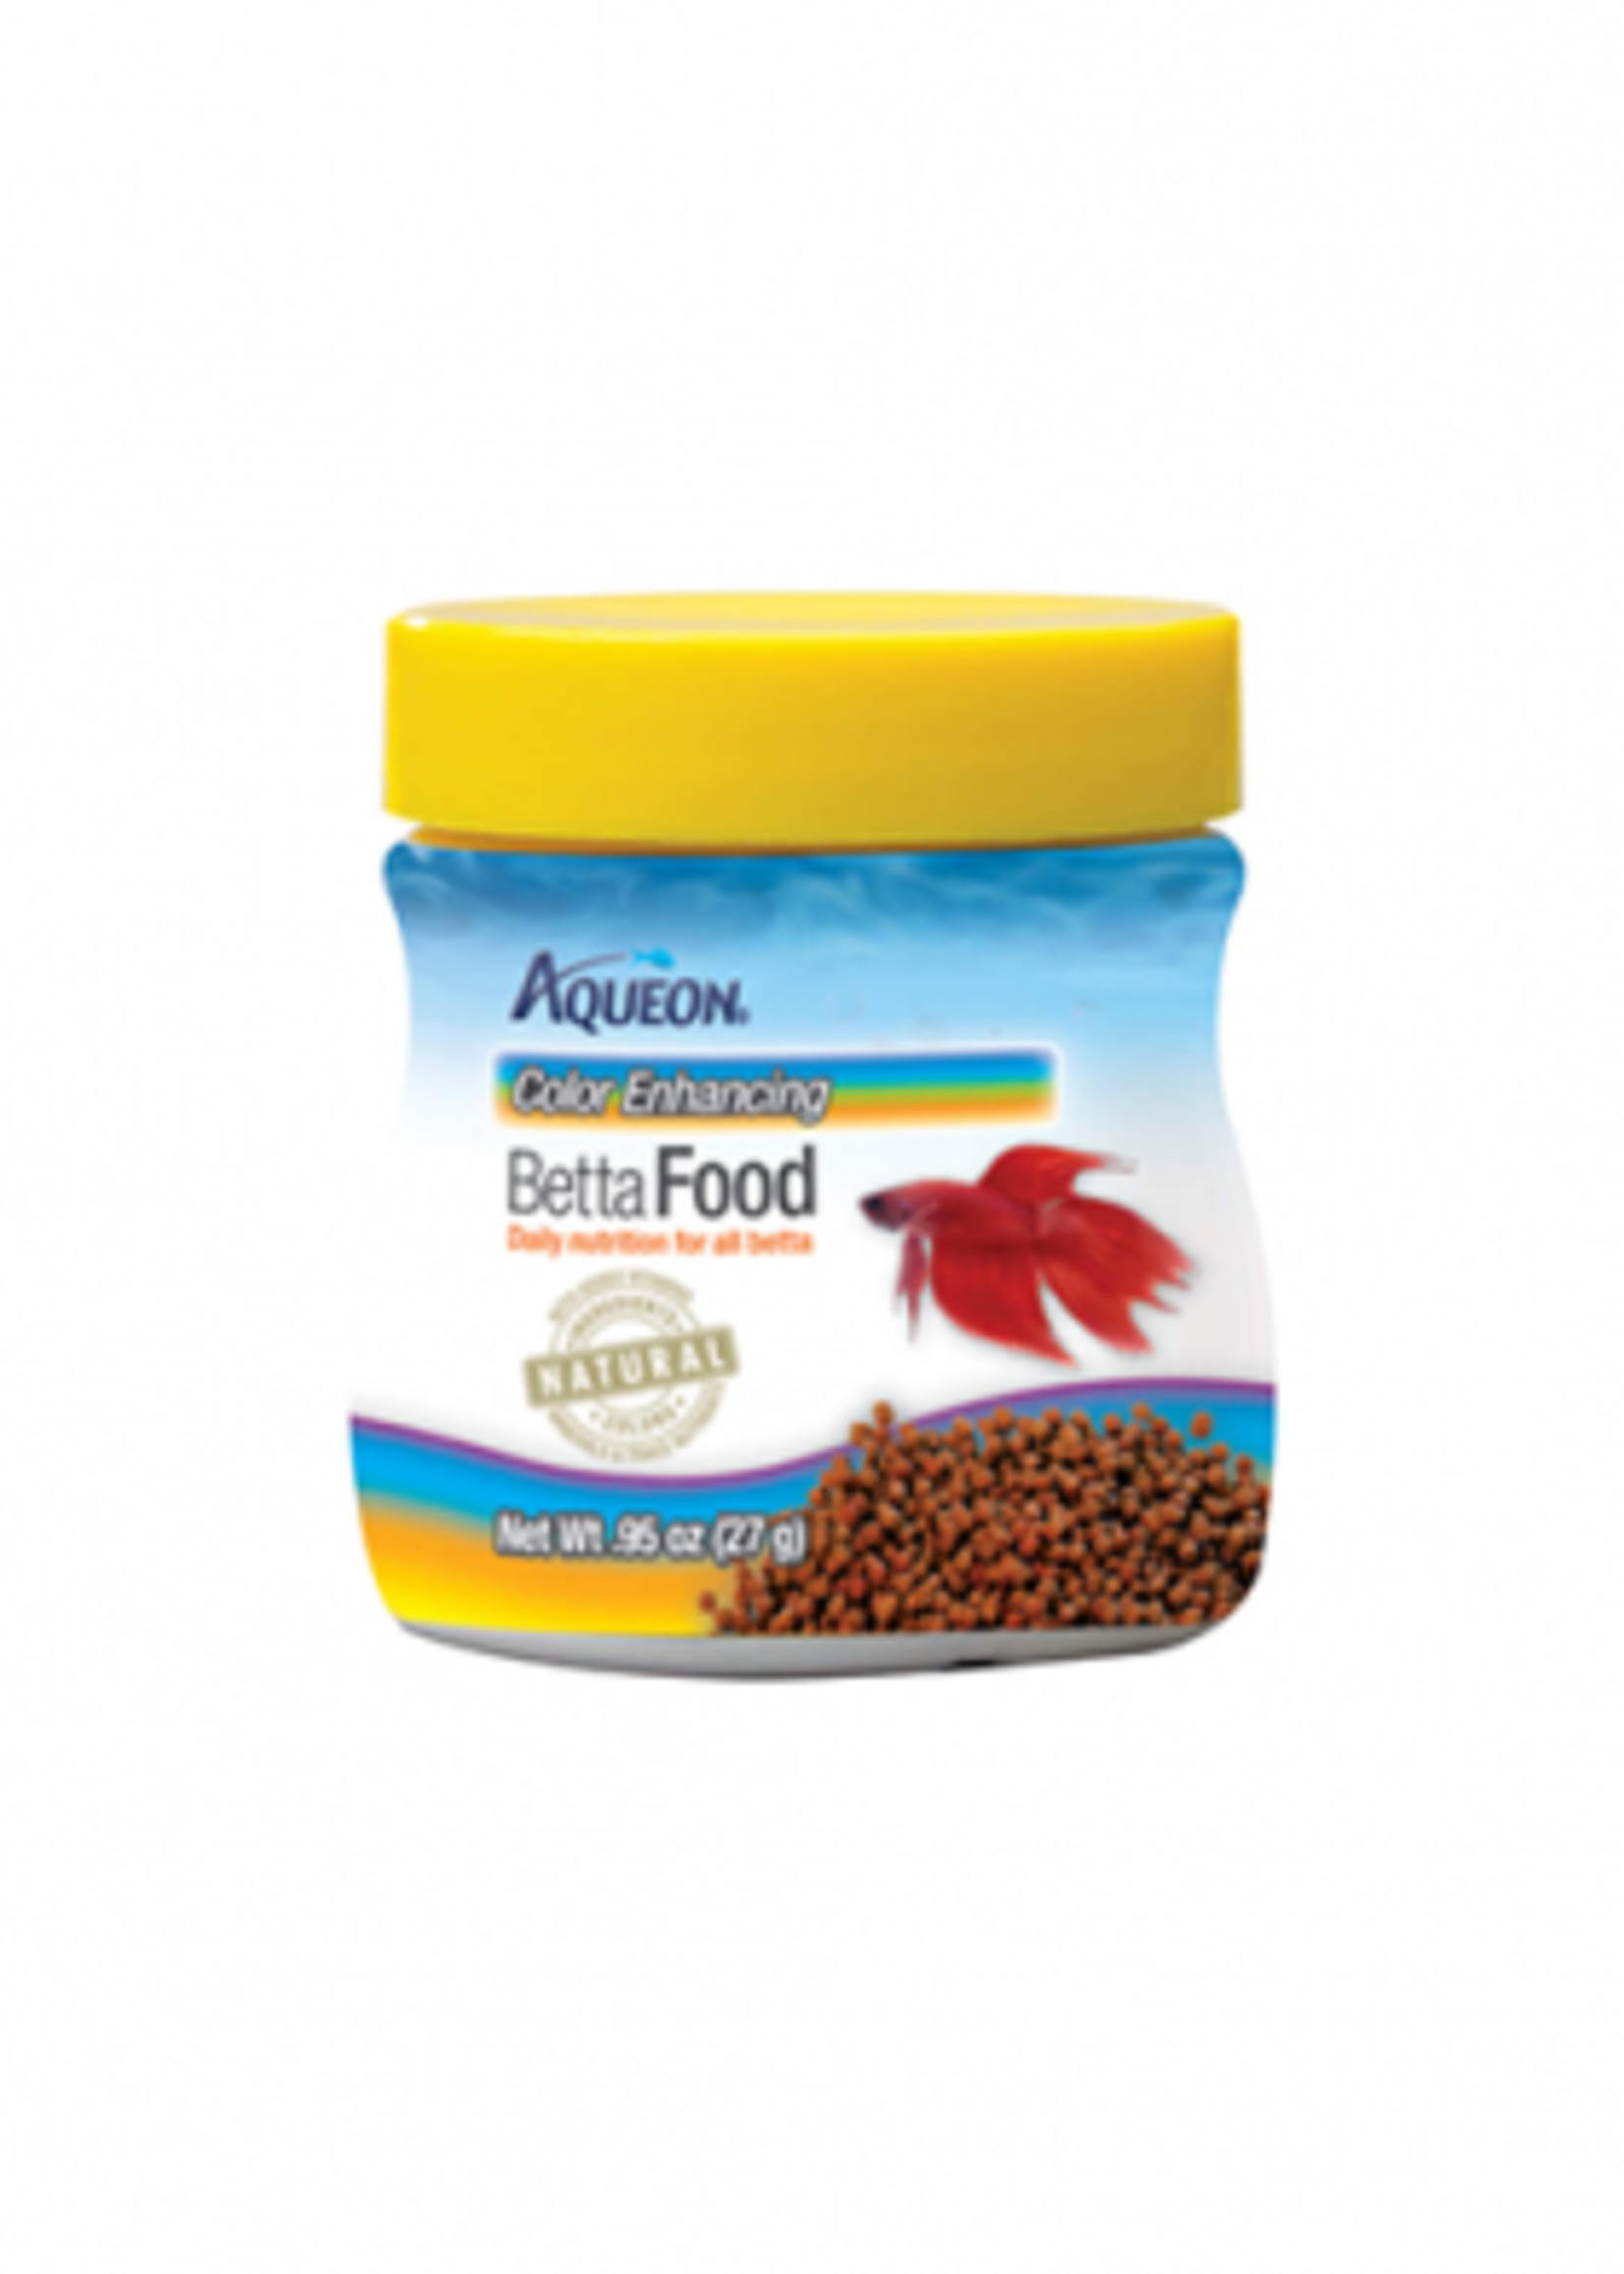 Aqueon® Color Enhancing Betta Food 0.95oz